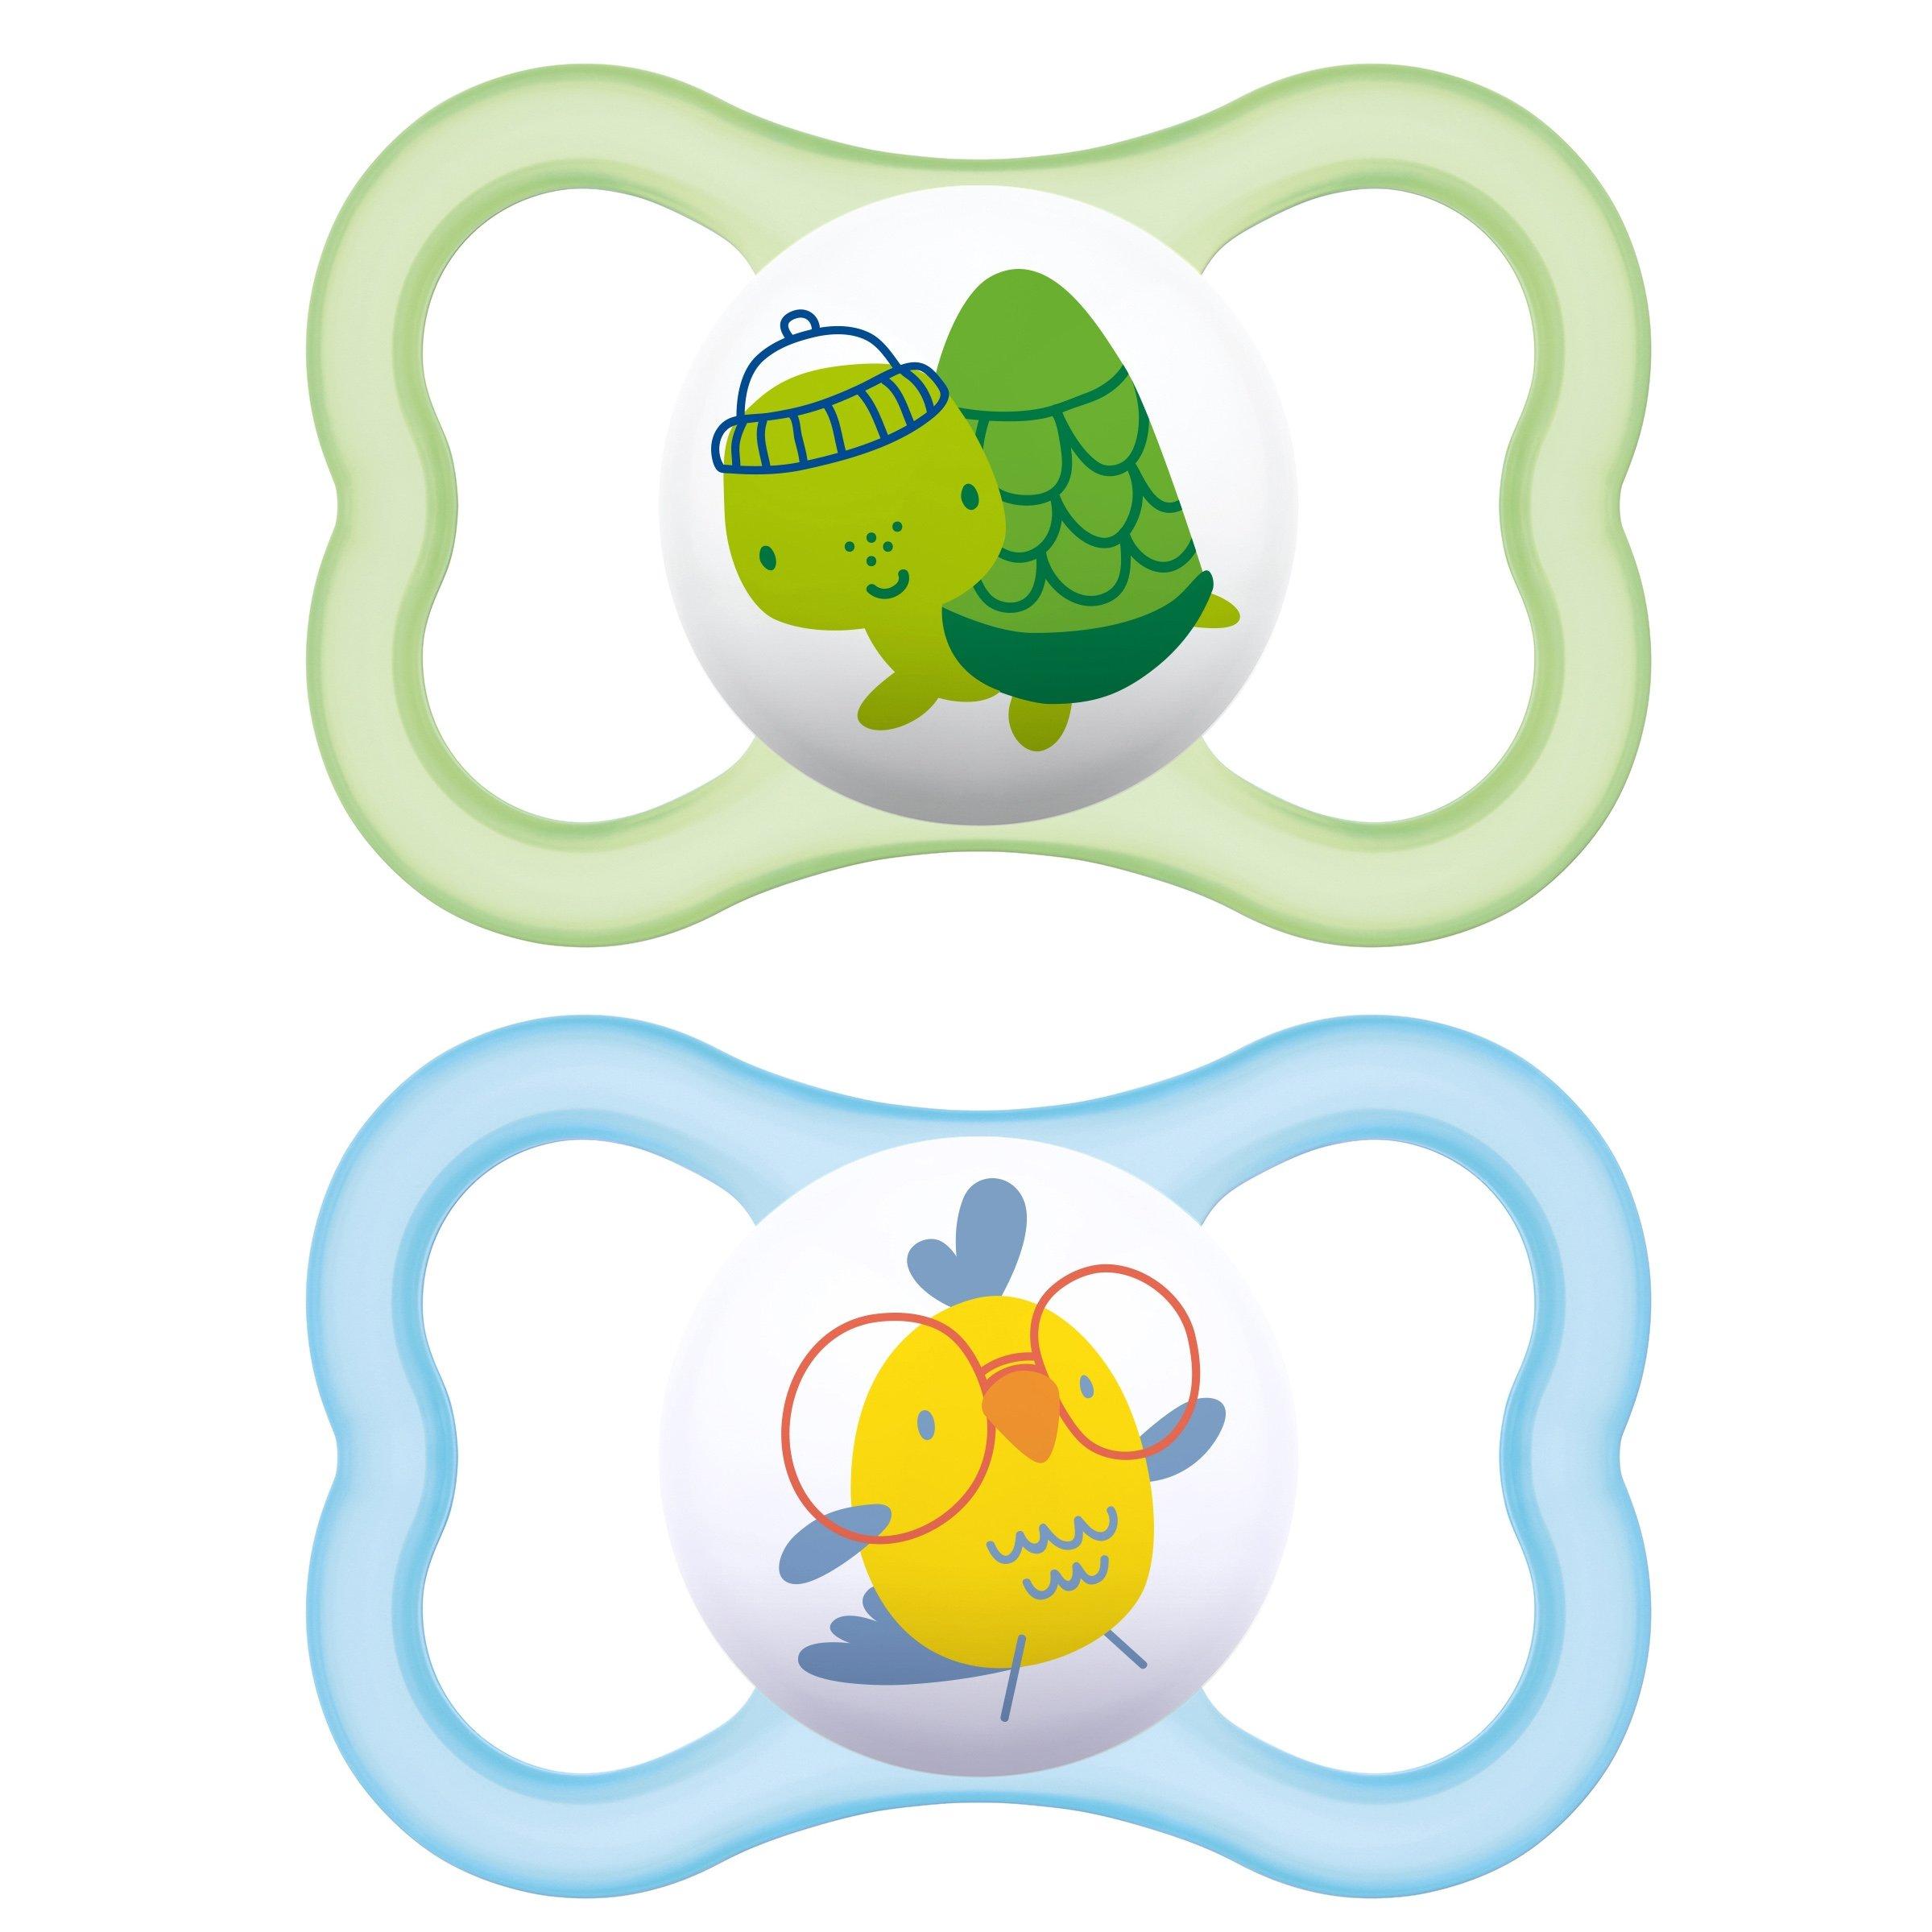 Mam Air Ορθοδοντική Πιπίλα Καουτσούκ Κωδ 216L από 6 Έως 16 Μηνών 2 Τεμάχια – Πράσινο – Γαλάζιο